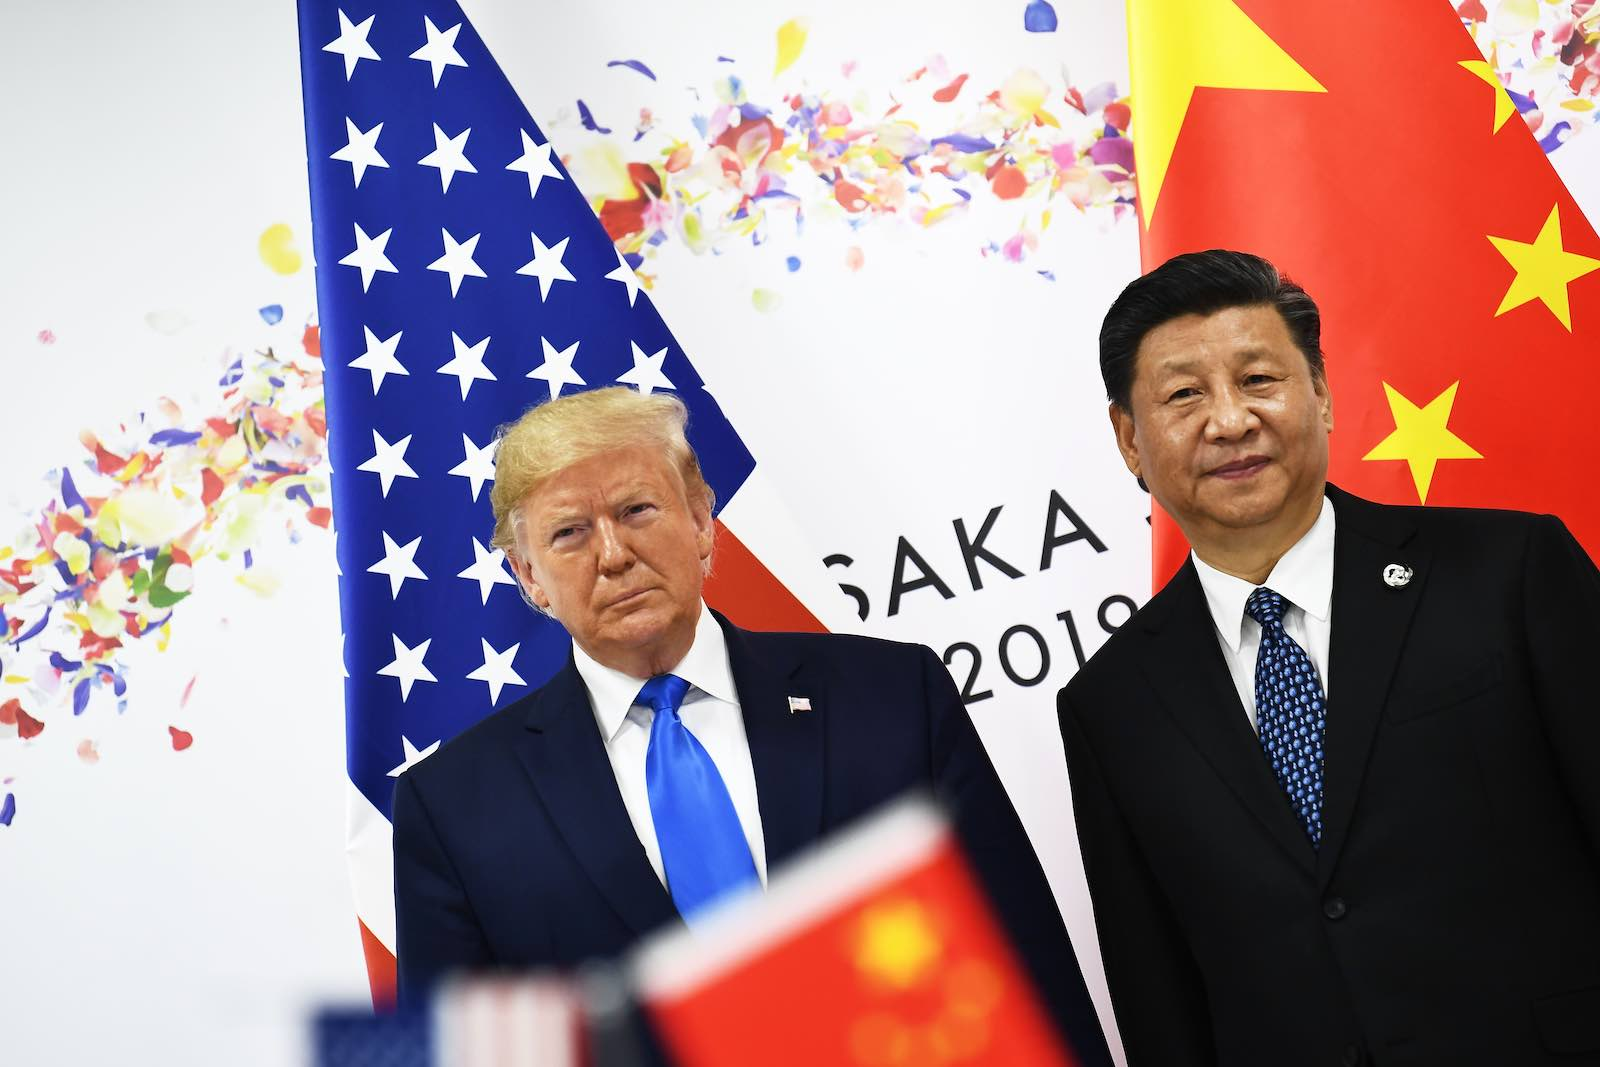 Donald Trump and Xi Jinping during talks at the Osaka G20 in Japan (Photo: Brendan Smialowski via Getty)